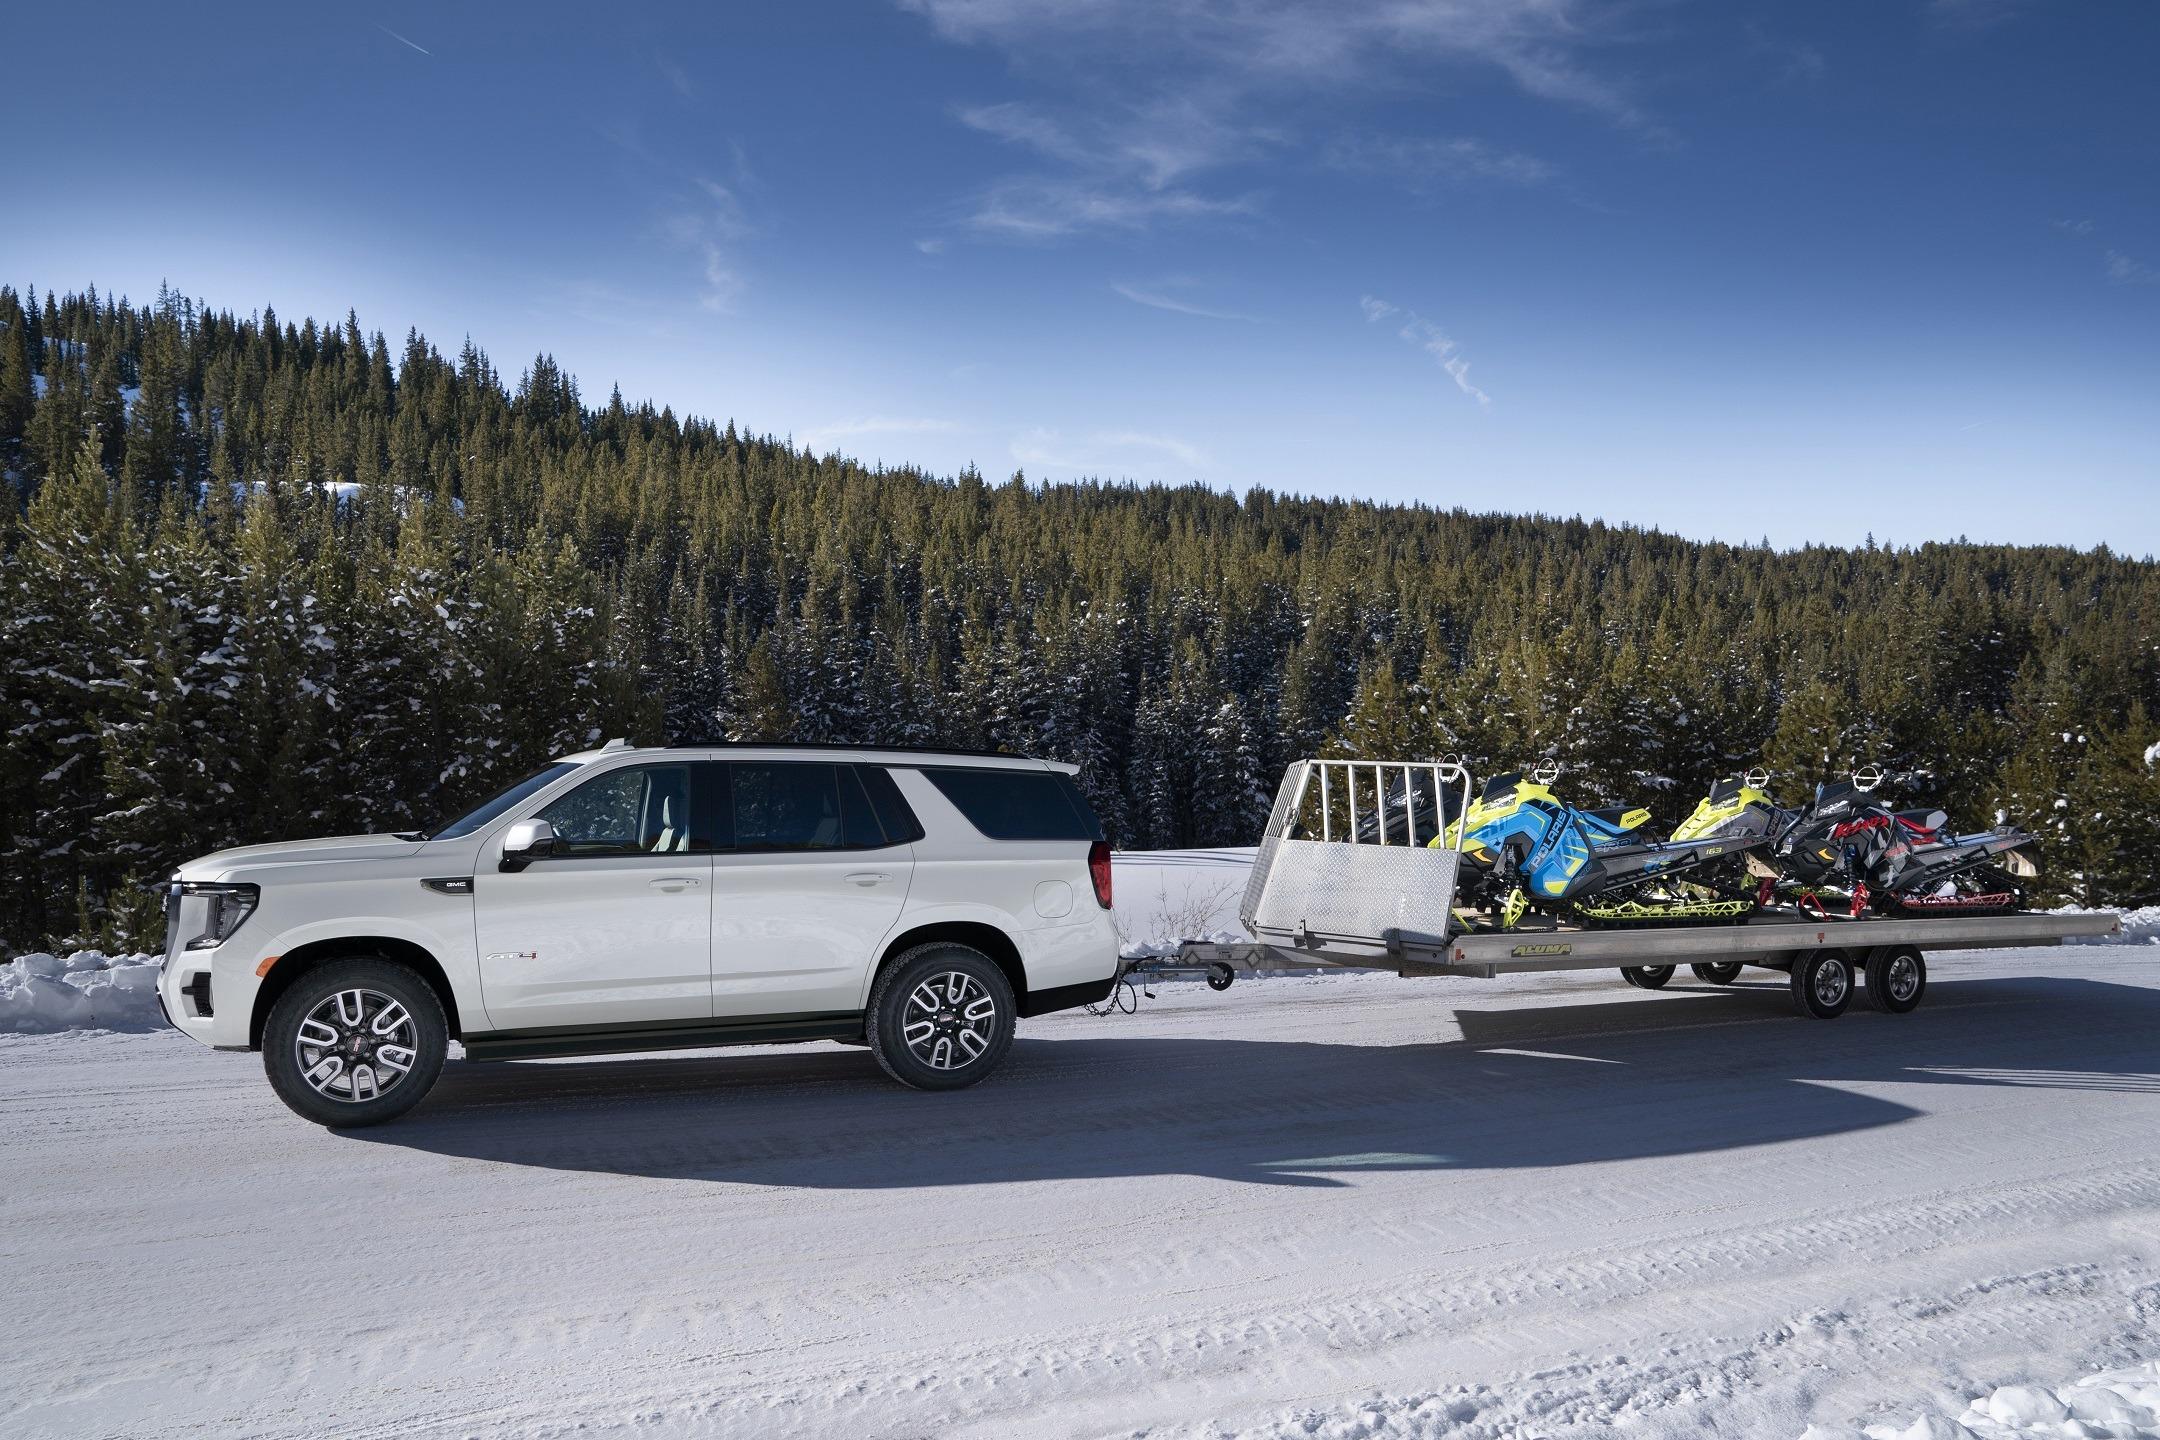 The 2021 Gmc Yukon And Yukon Xl Unveiled Eagle Ridge Gm